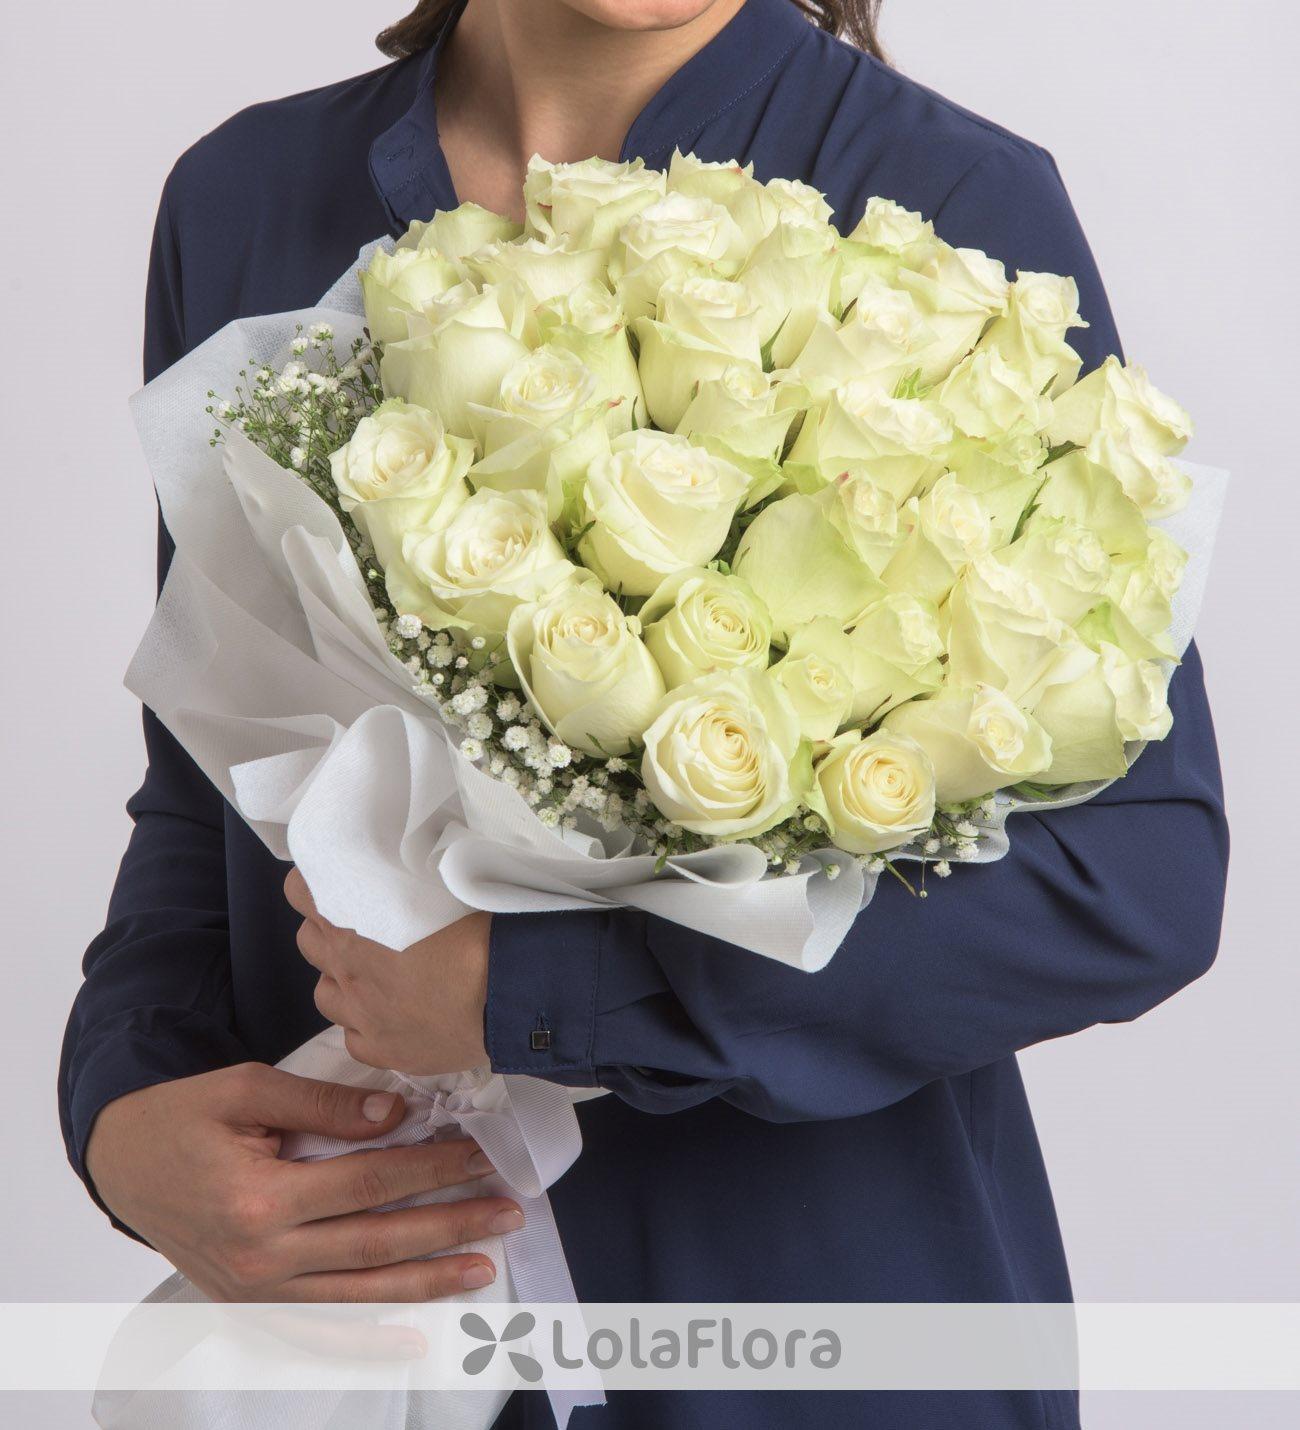 Rosa blanca